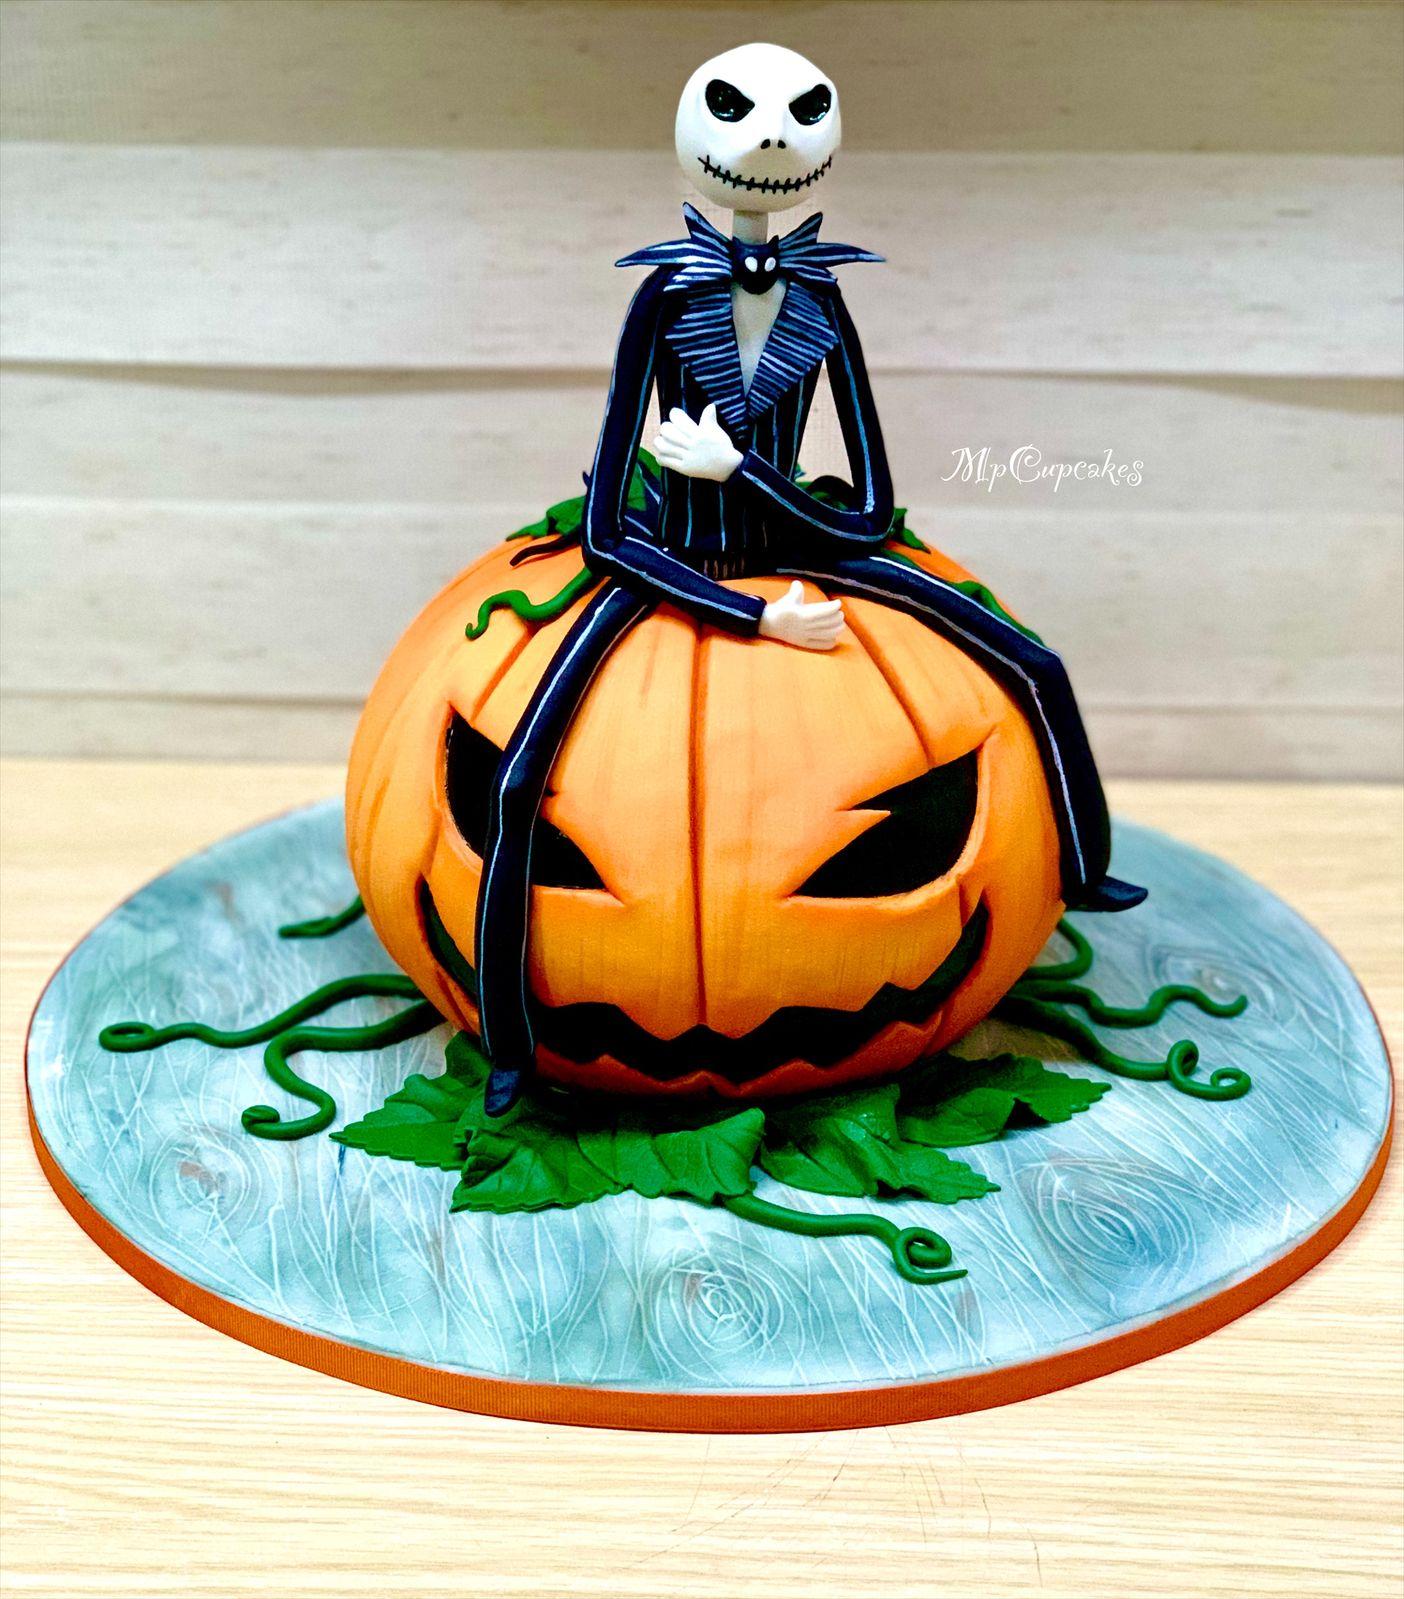 Torta Halloween Torta Calabaza Torta Jack Torta Dibujo Torta De Halloween Calabazas